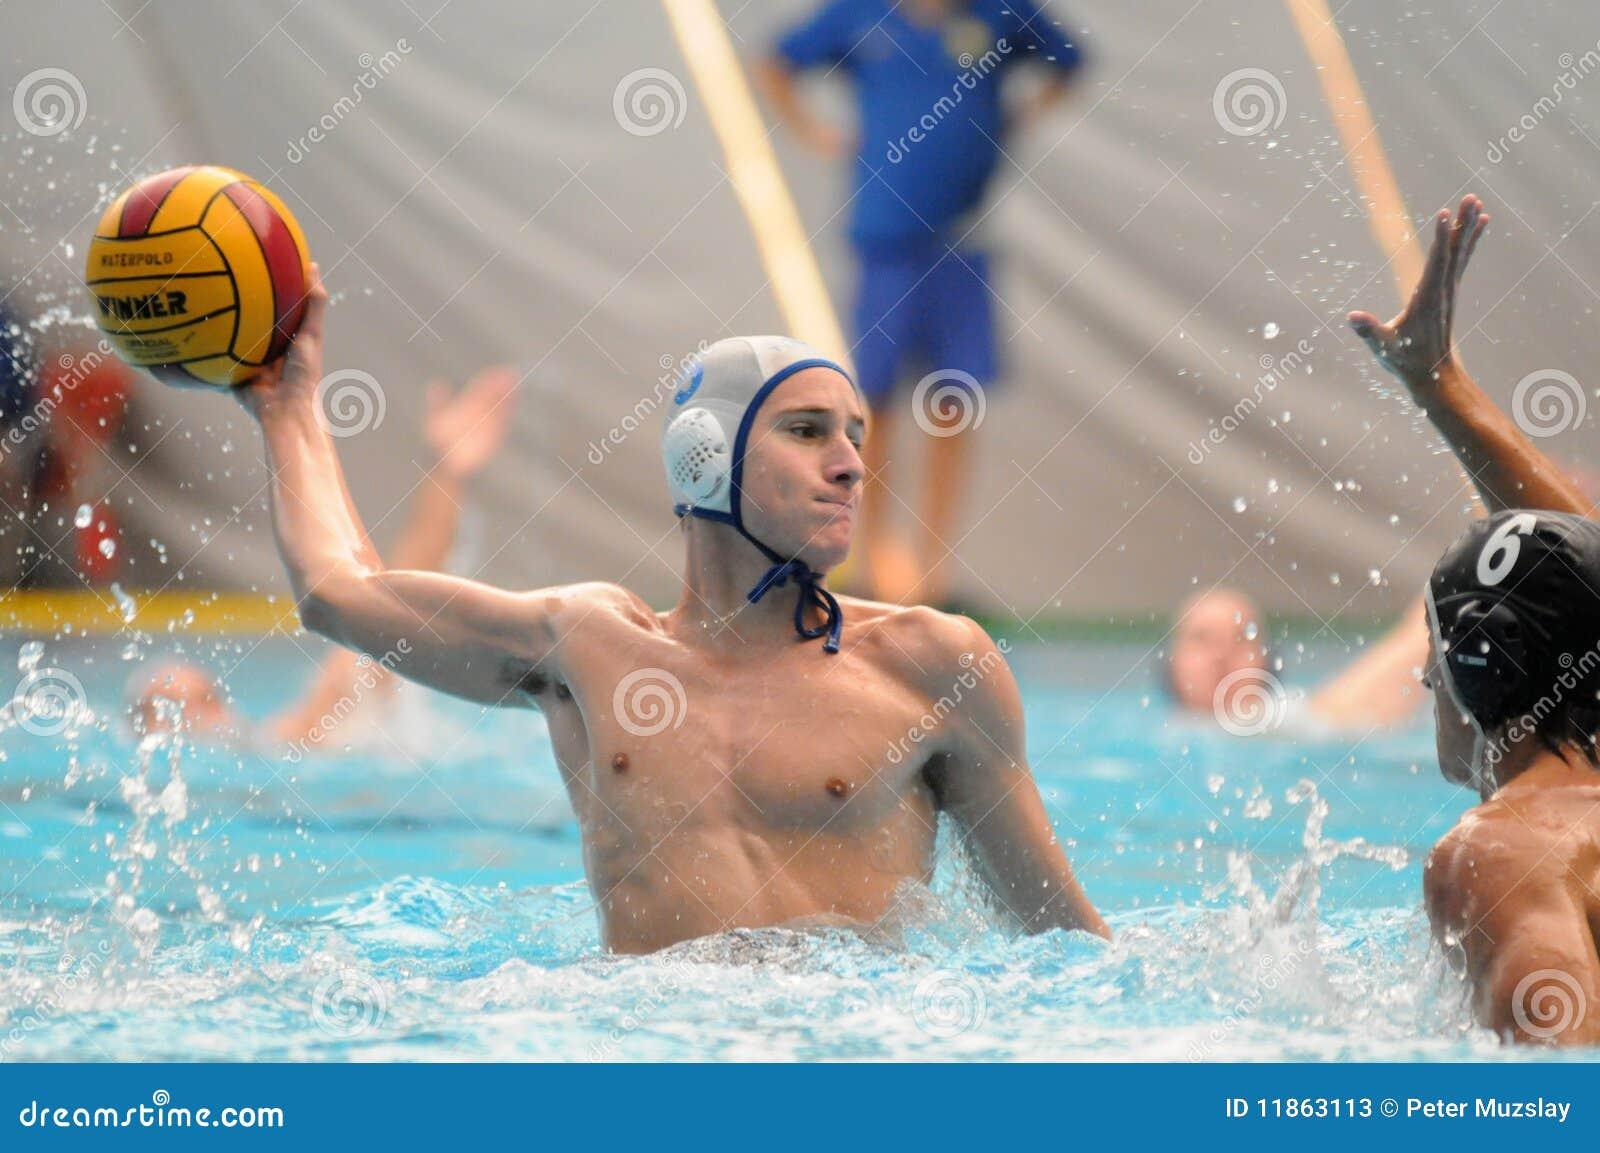 - kaposvar-kecskemet-waterpolo-game-11863113